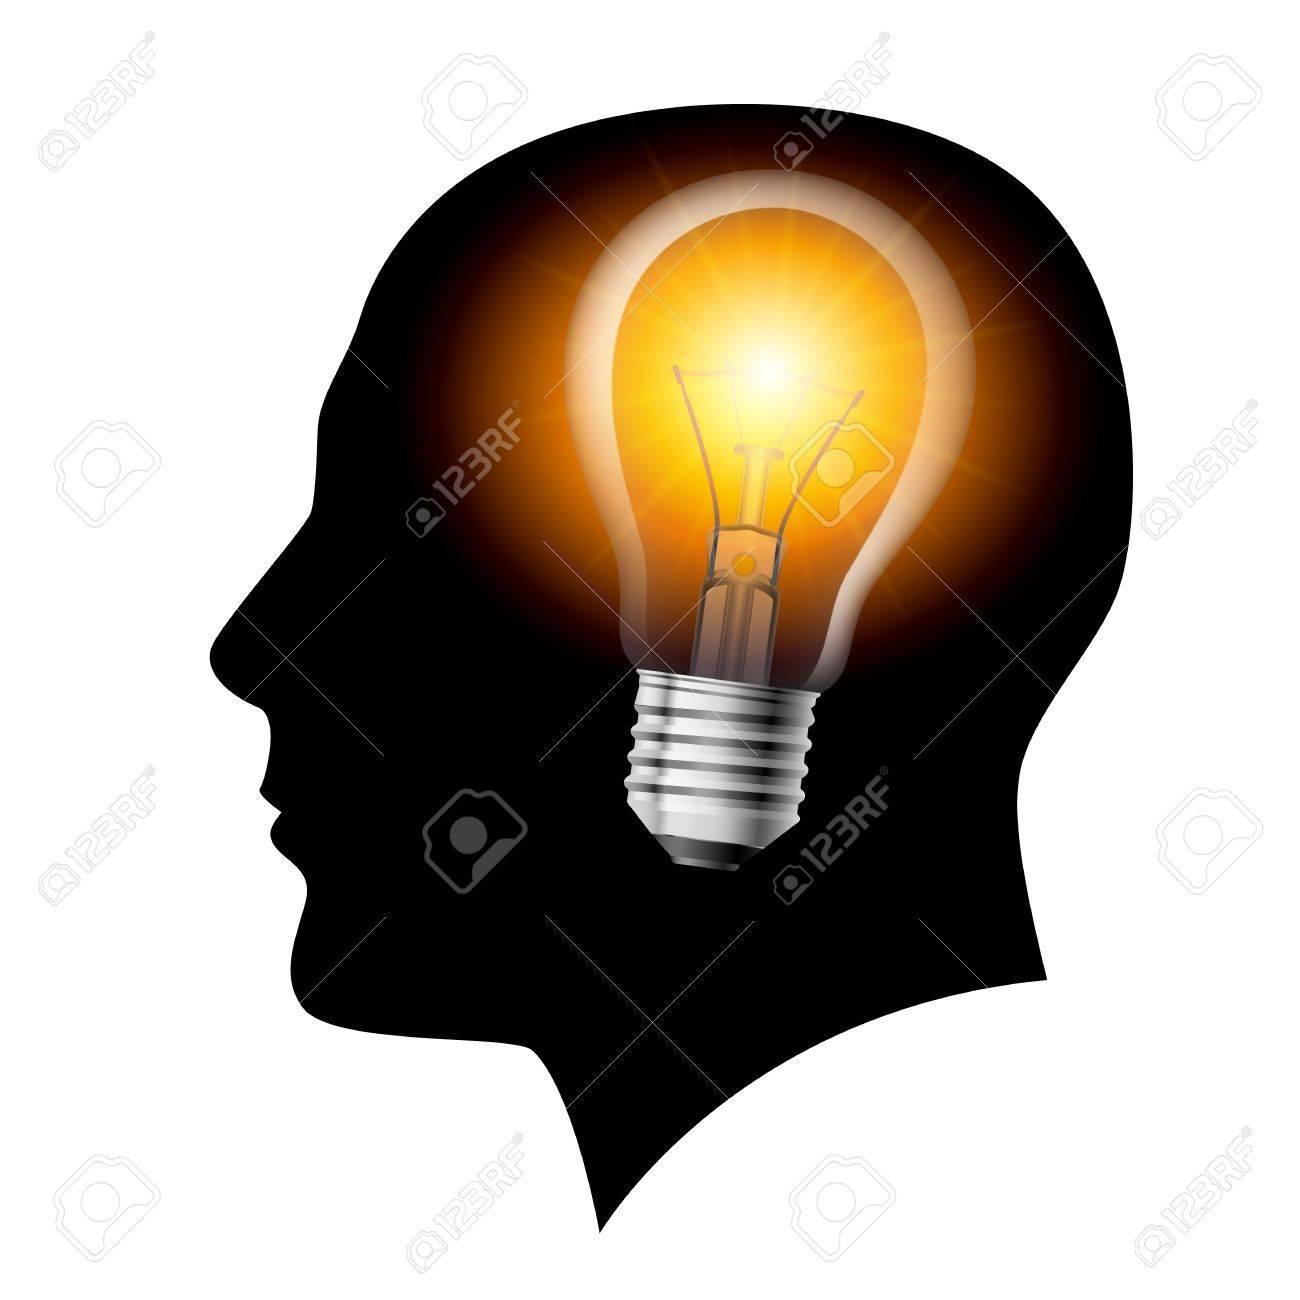 Creative ideas light Filament Lamp. Illustration on white Stock Vector - 12676346